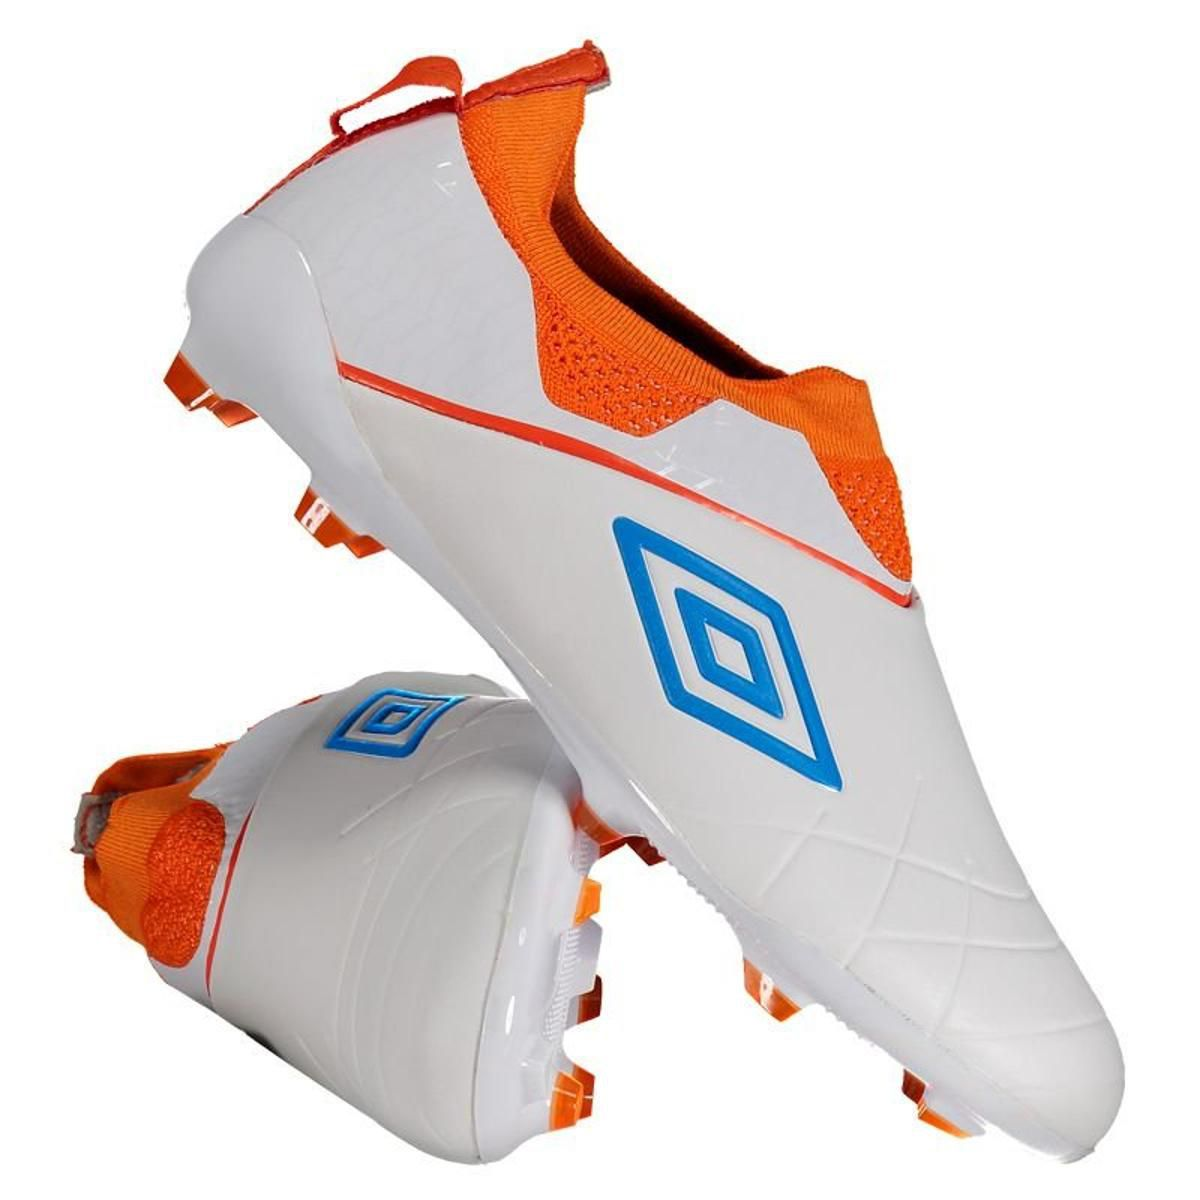 Chuteira Umbro Medusae III Pro 0F70099 Branco-Laranja-Azul  - Dozze Shoes